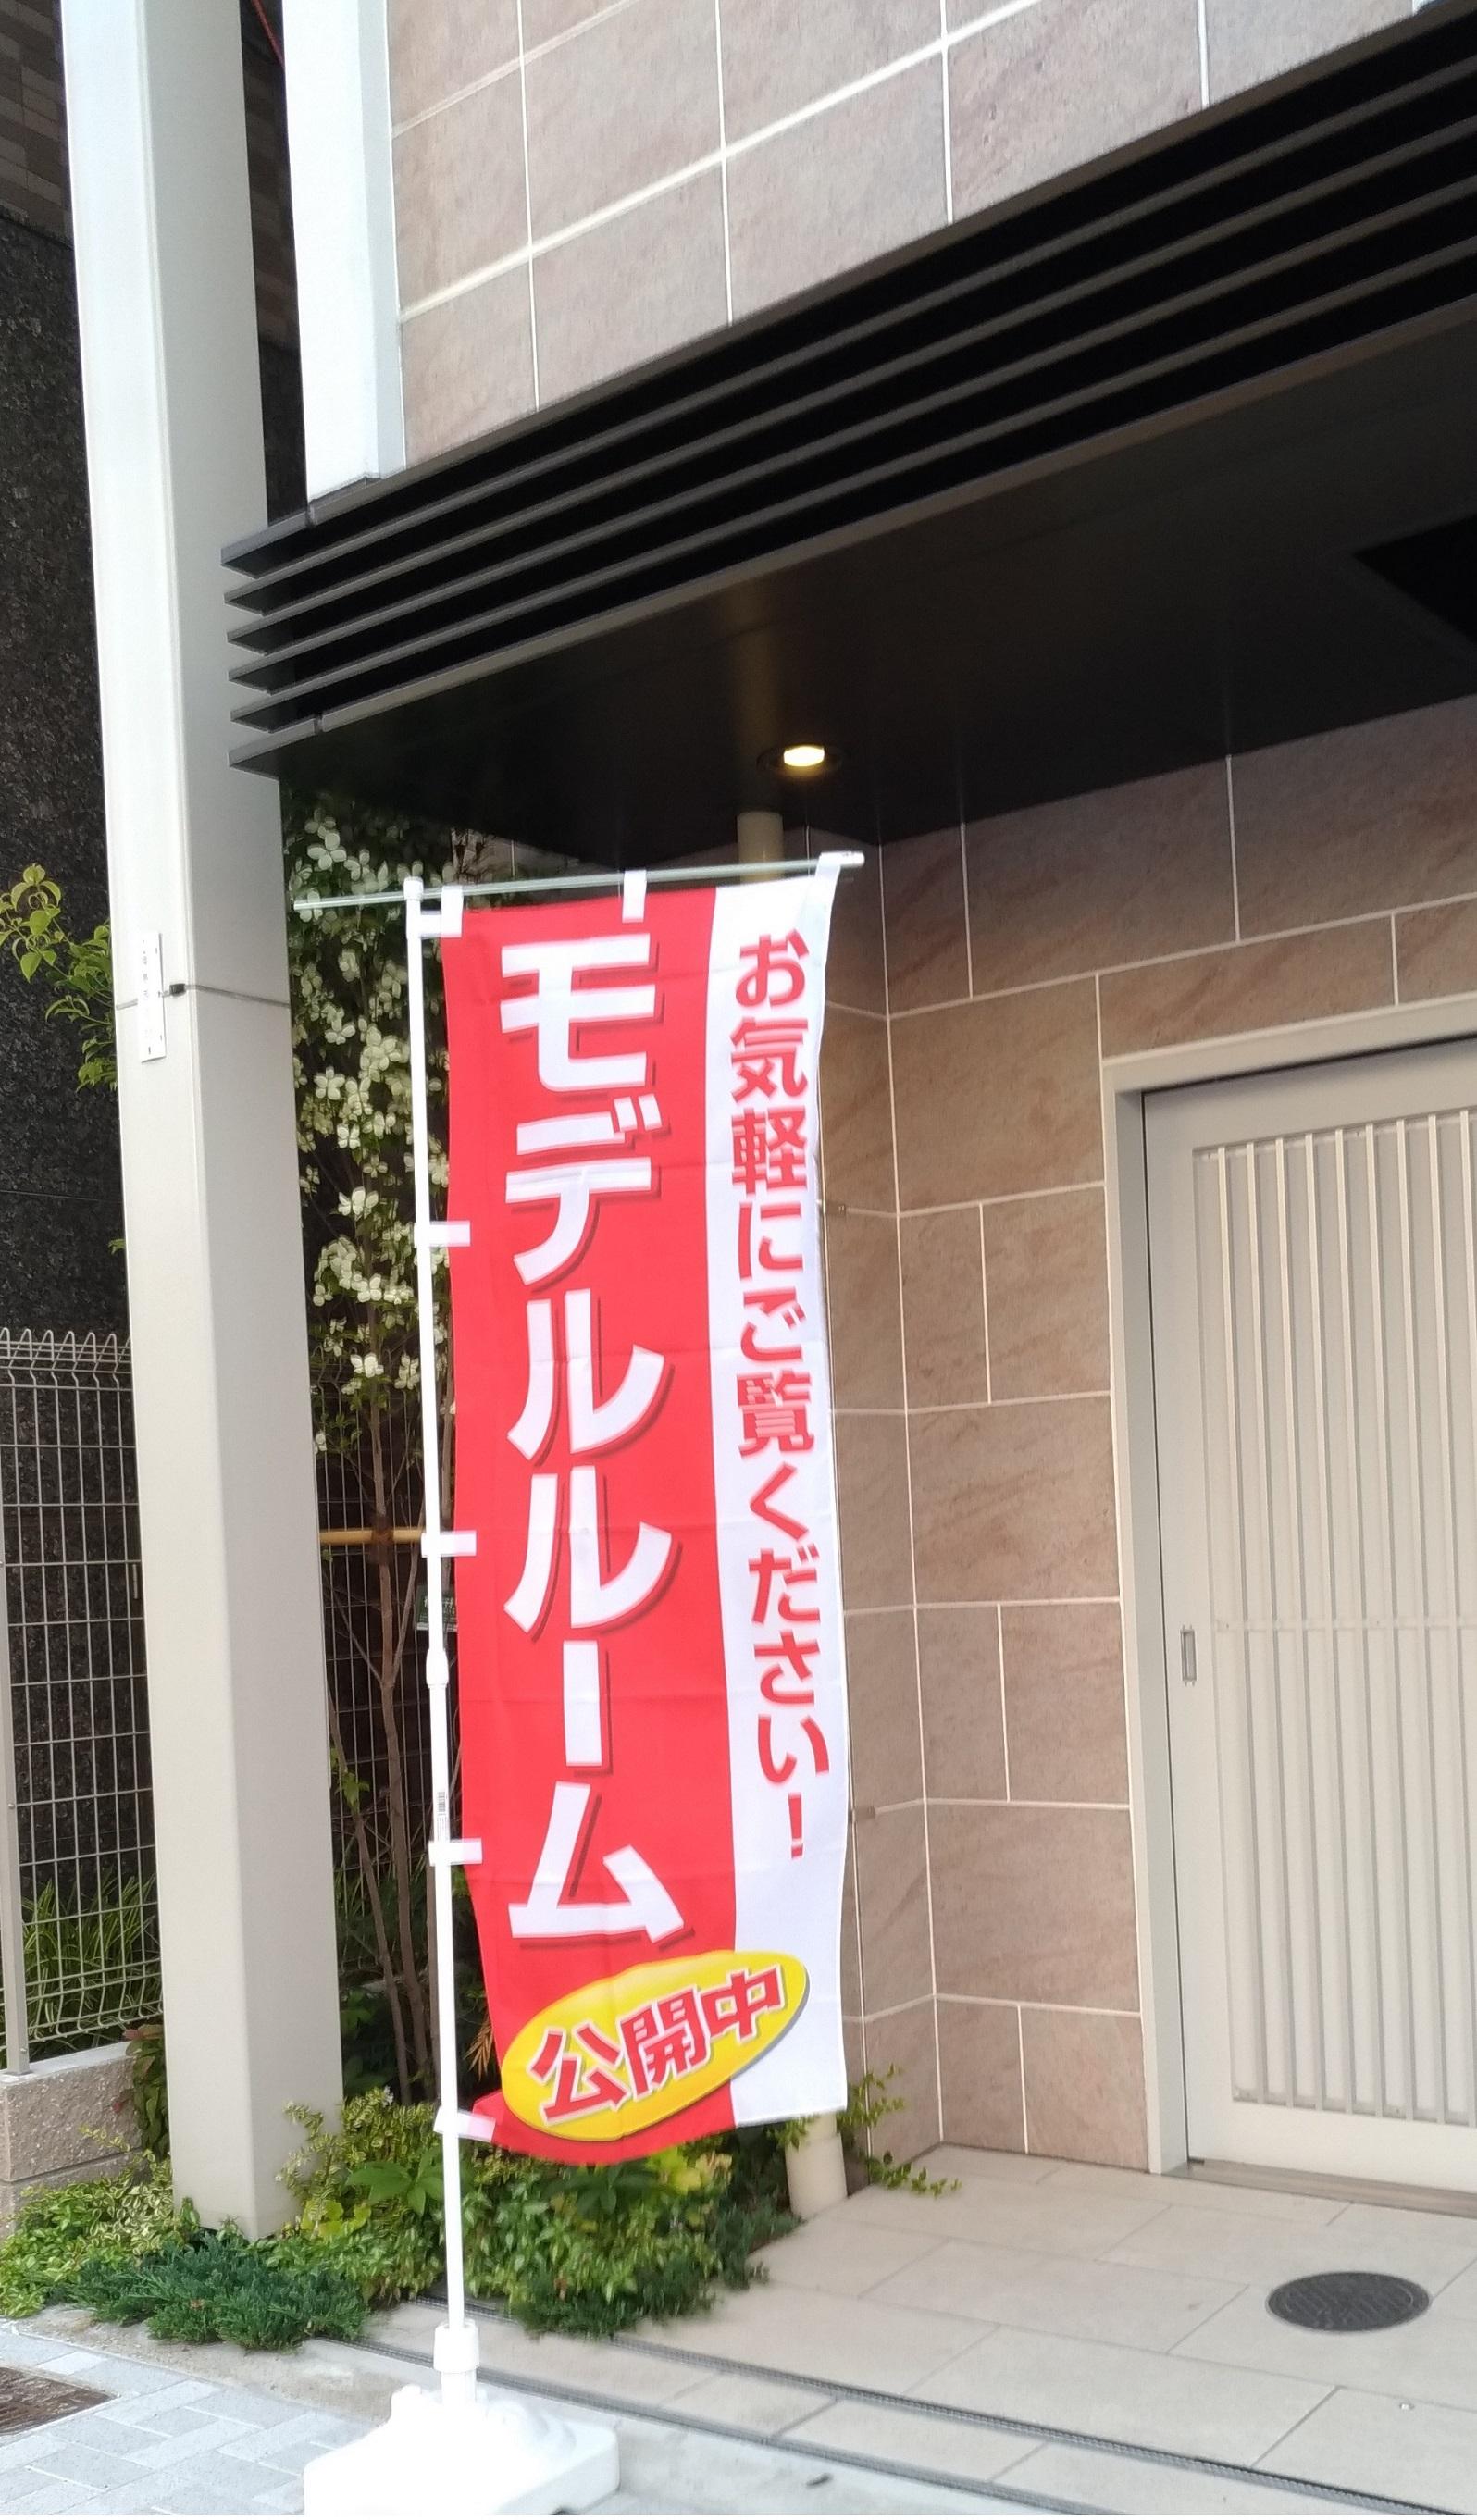 osaka_kitaku_manshon_toshi_3.jpg